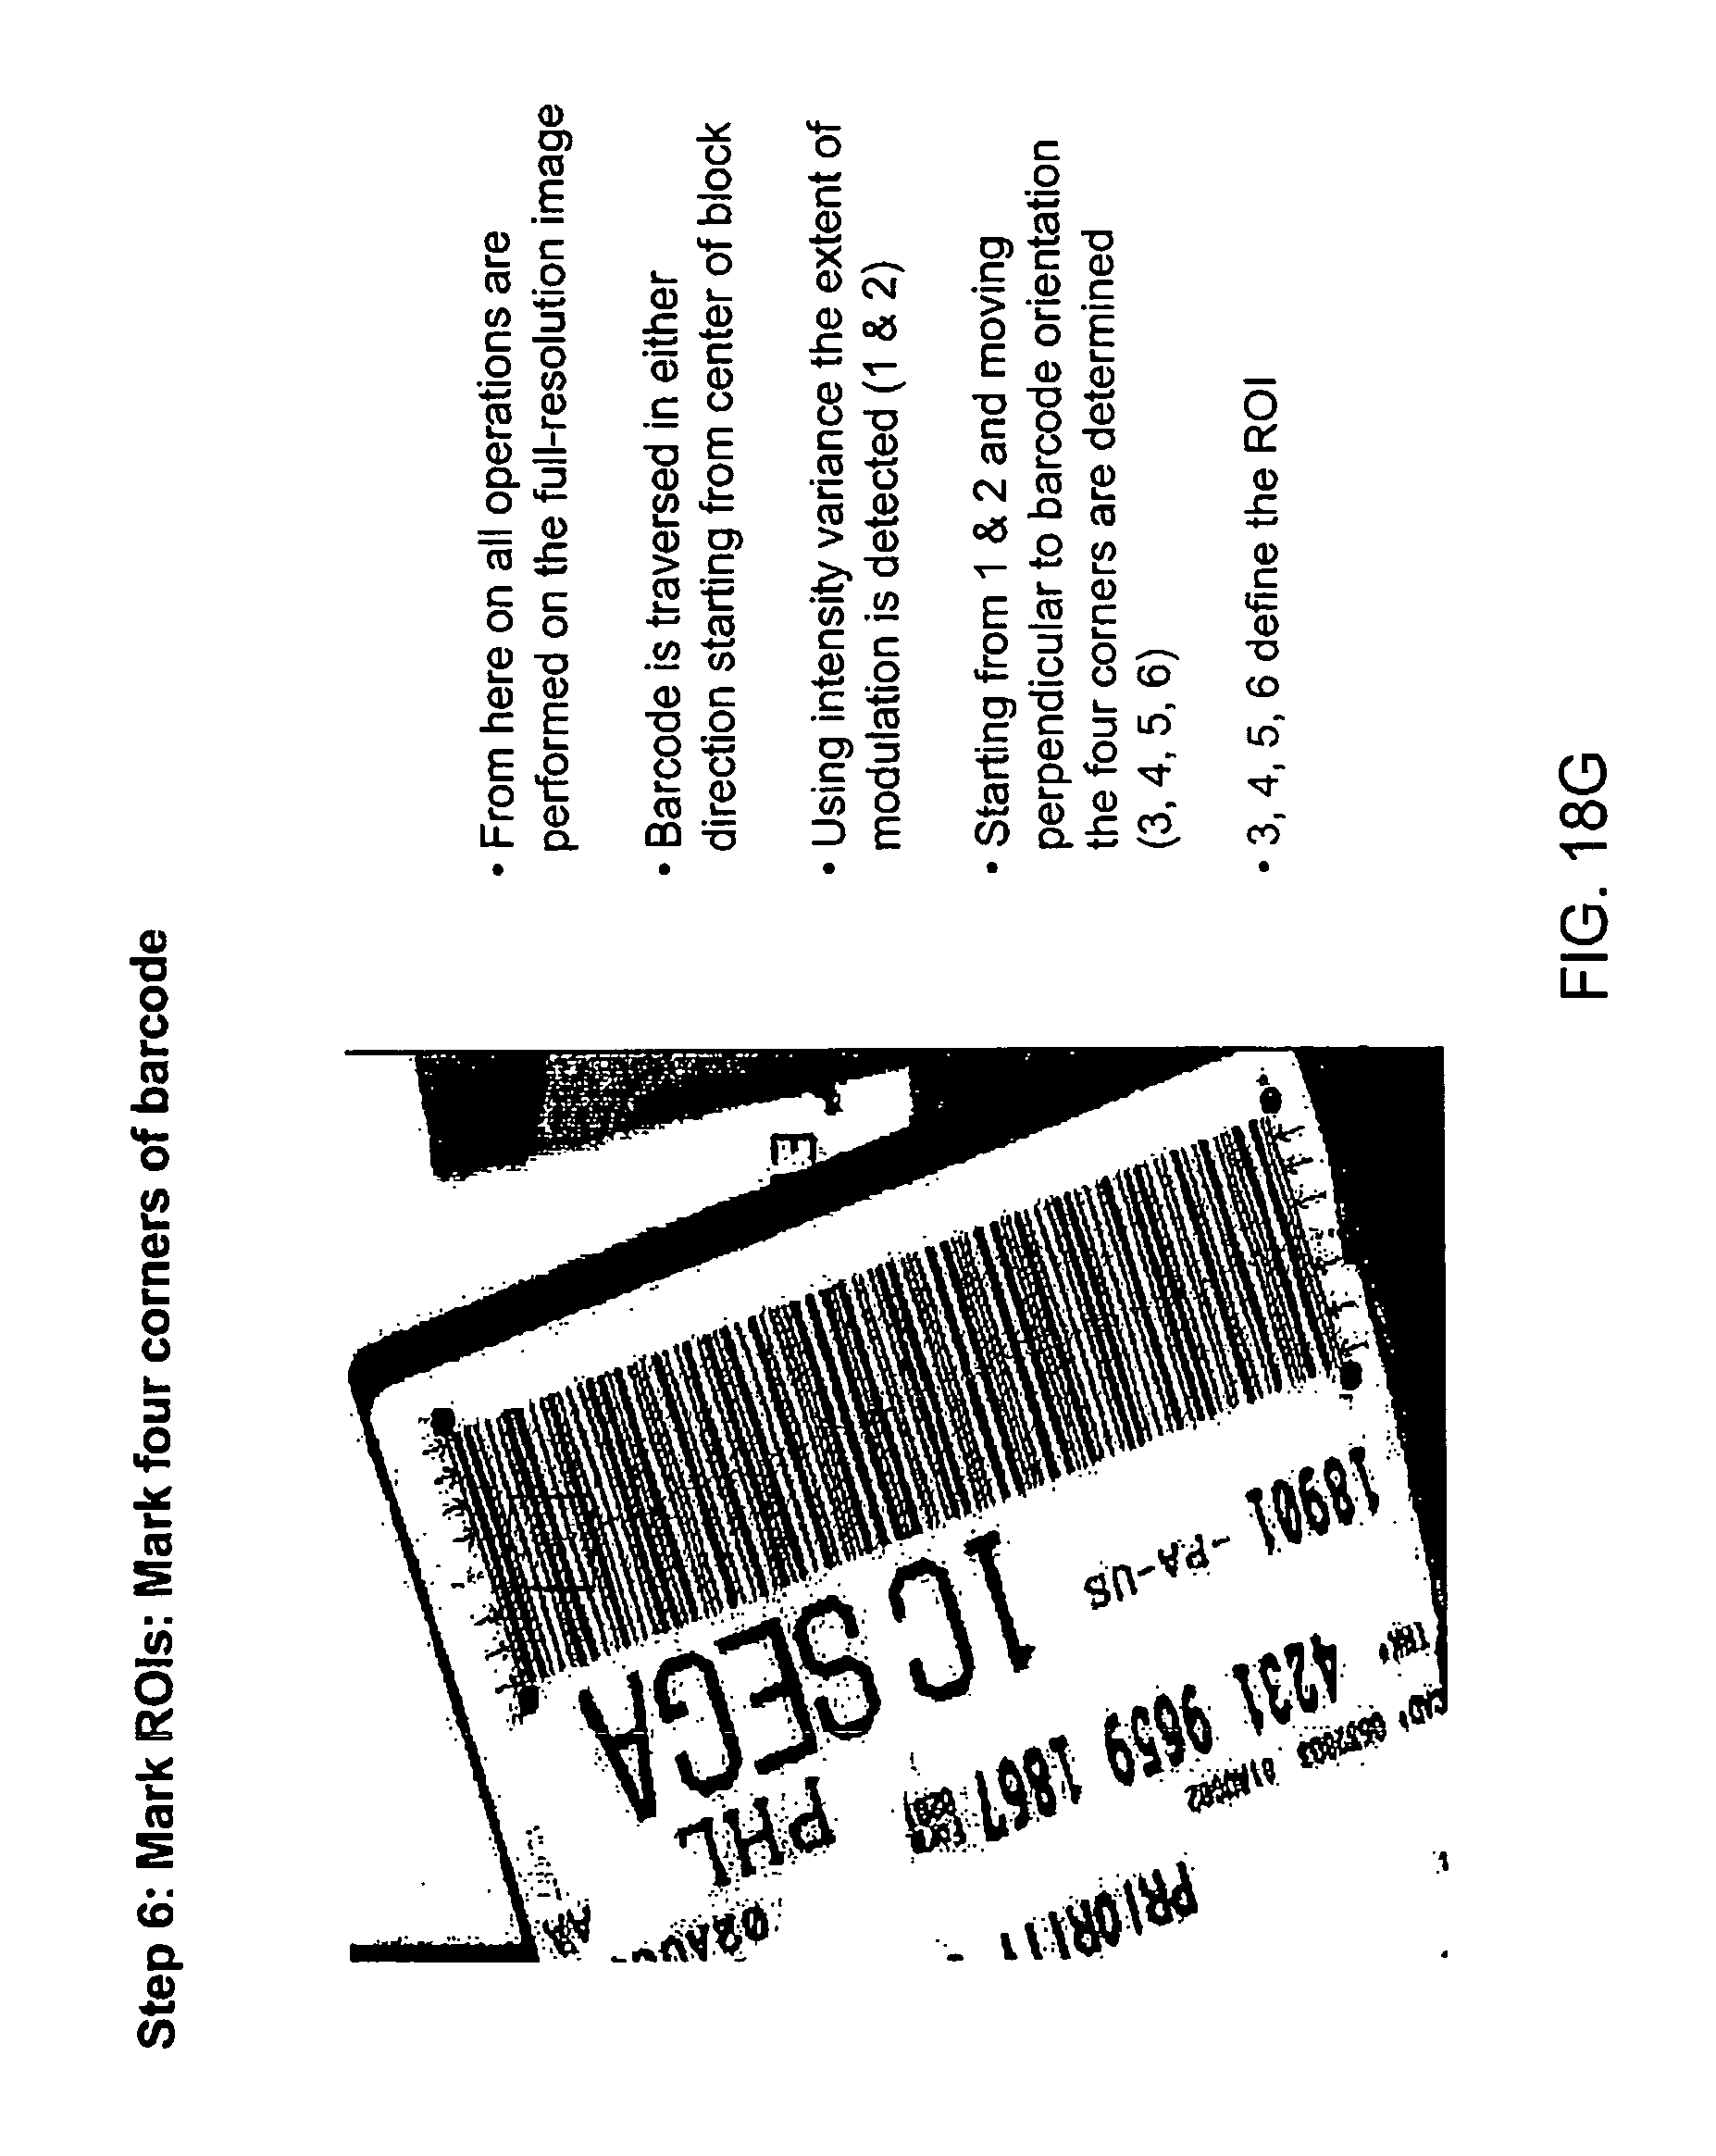 patente us7347374